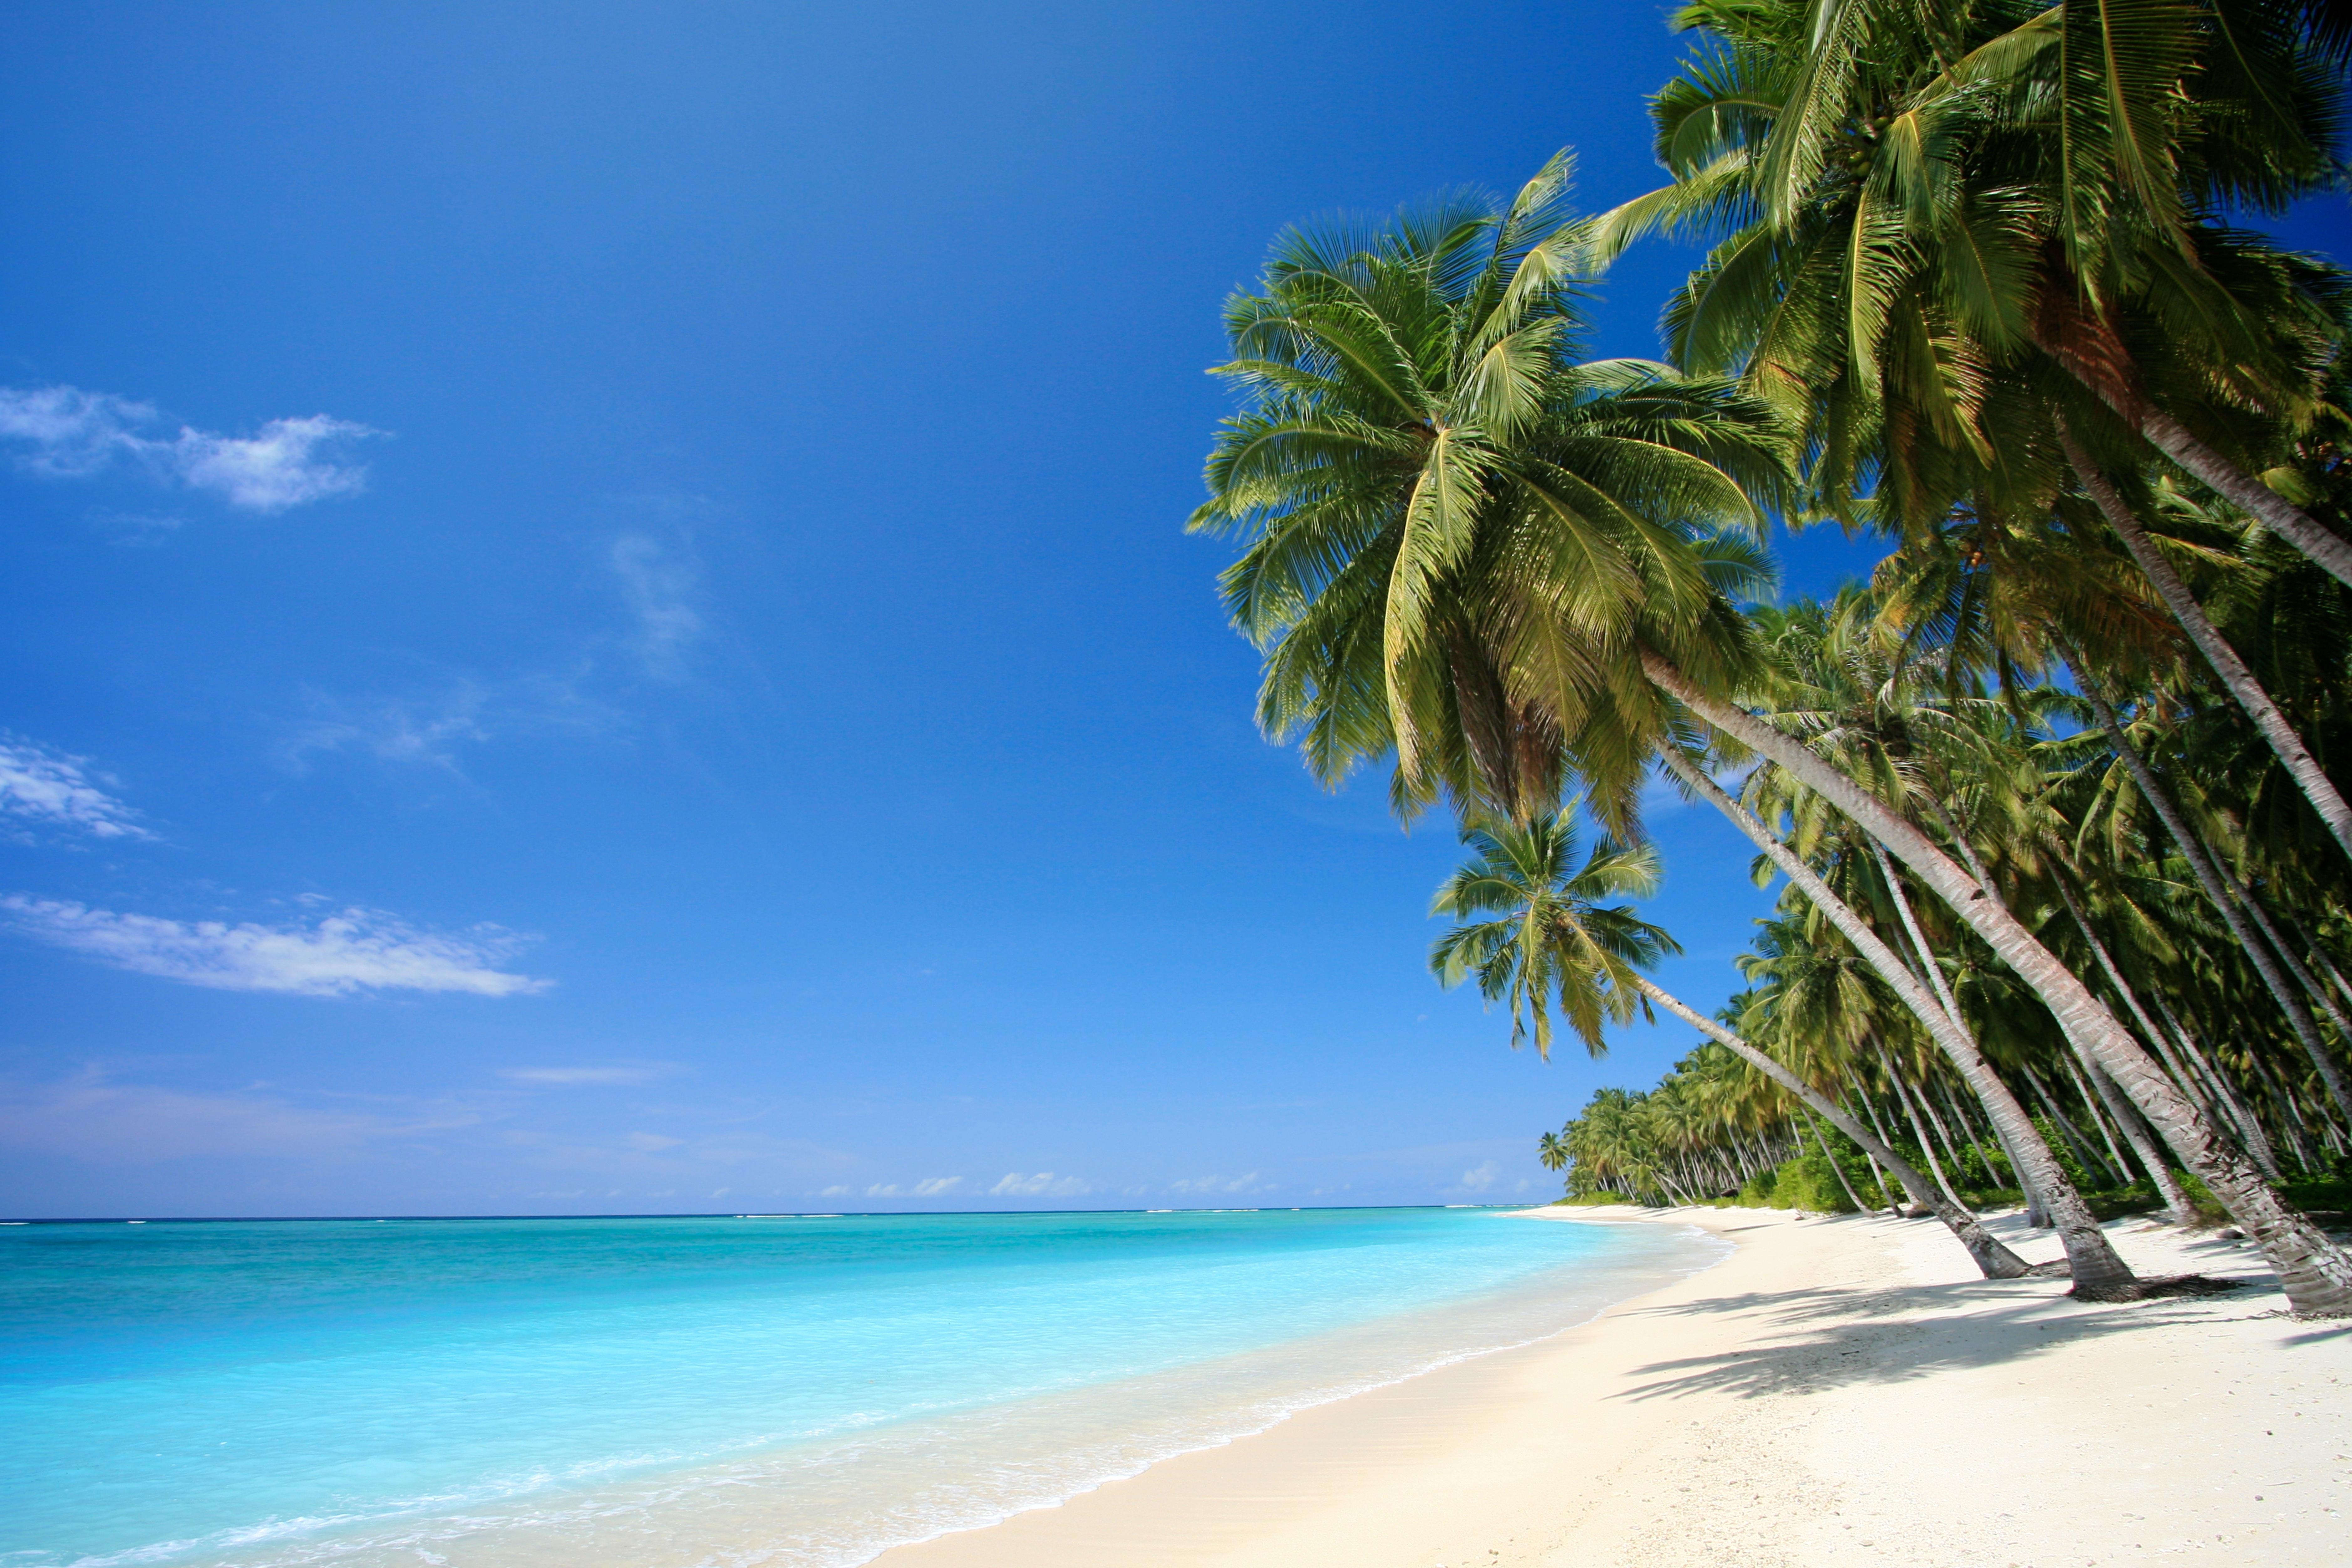 Beach Screensaver, wallpaper, Tropical Beach Screensaver hd wallpaper ...